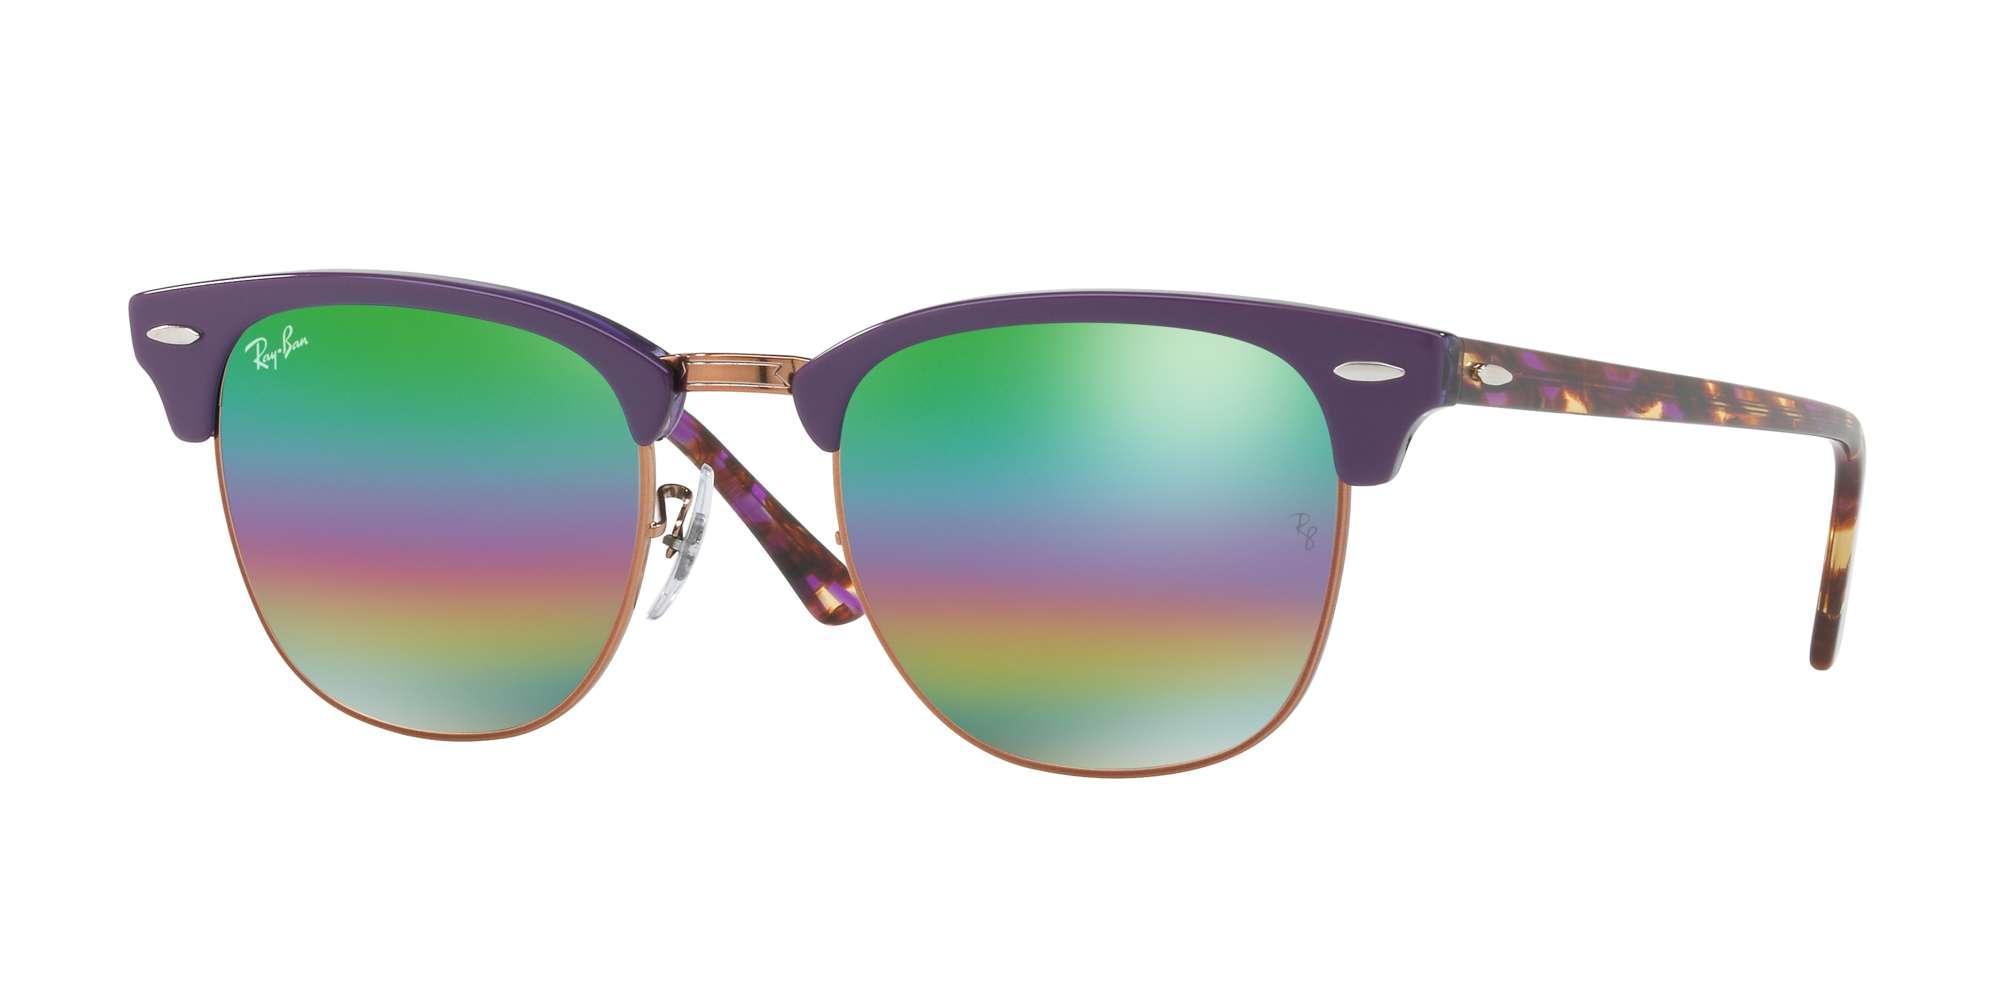 METALLIC MEDIUM BRONZE / LIGHT GREY MIRROR RAINBOW 2 lenses